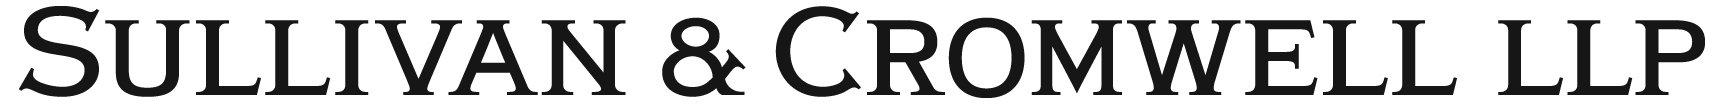 Image result for sullivan cromwell logo